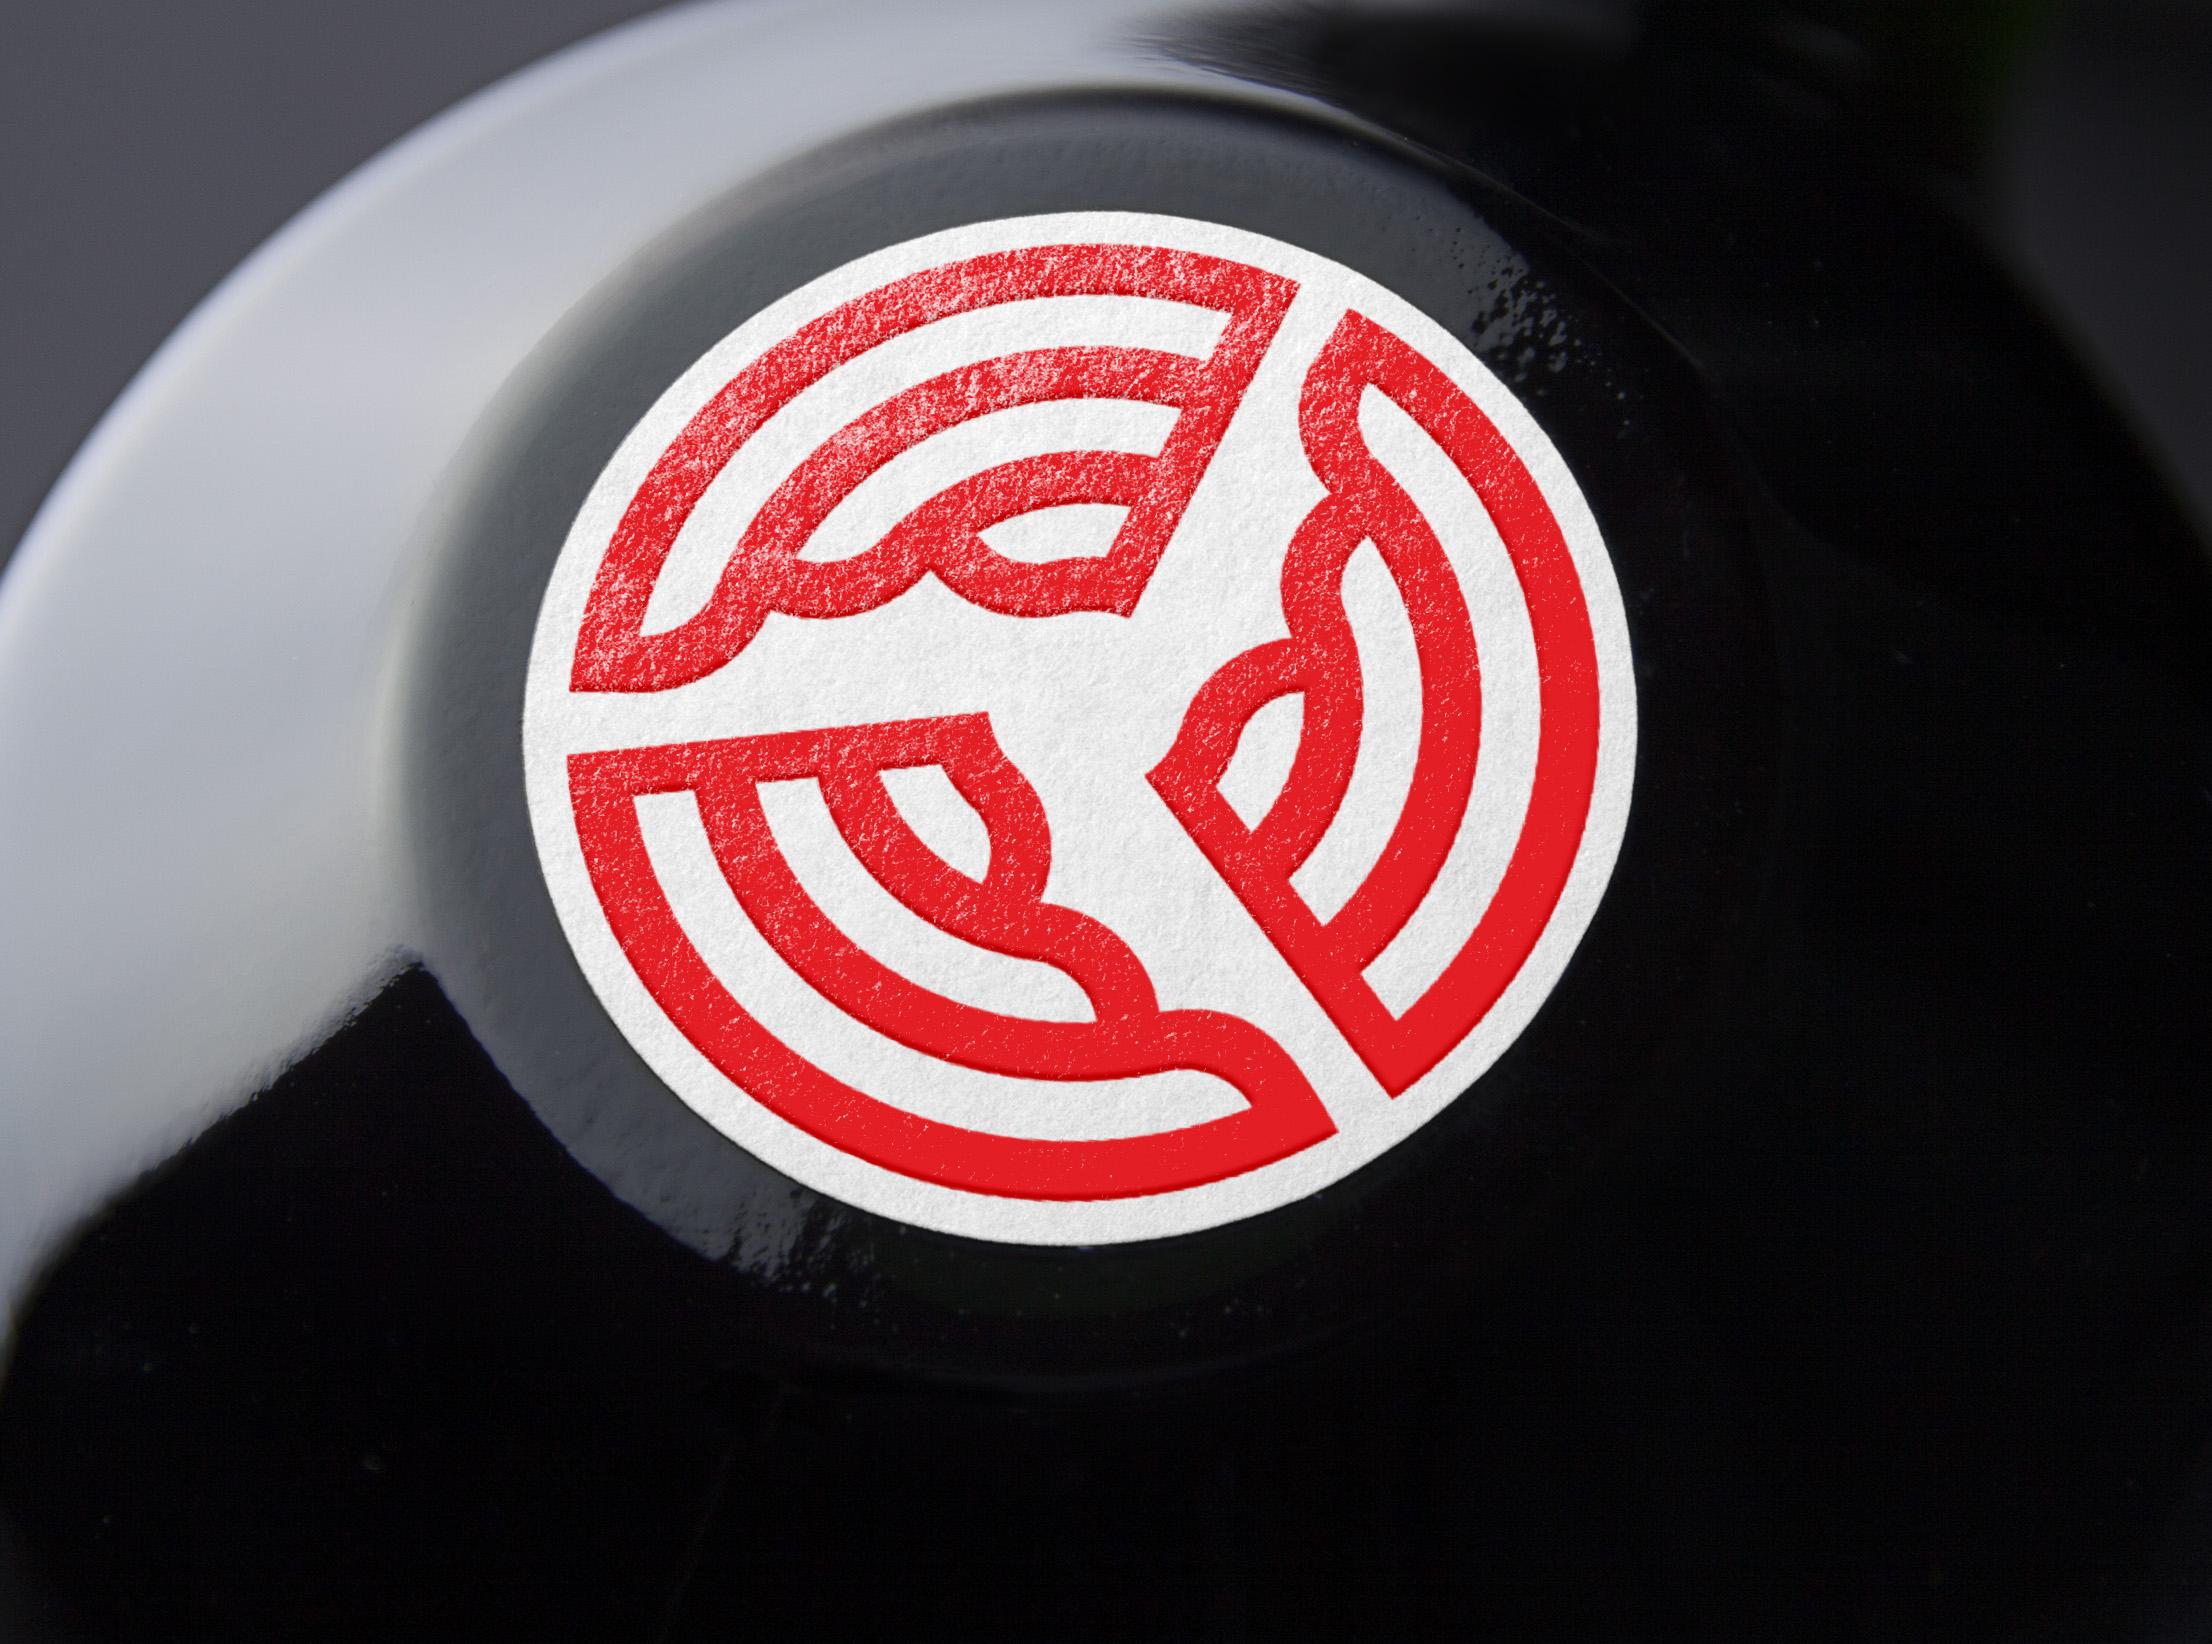 Придумать классный логотип фото f_89159879dfd5b10e.jpg